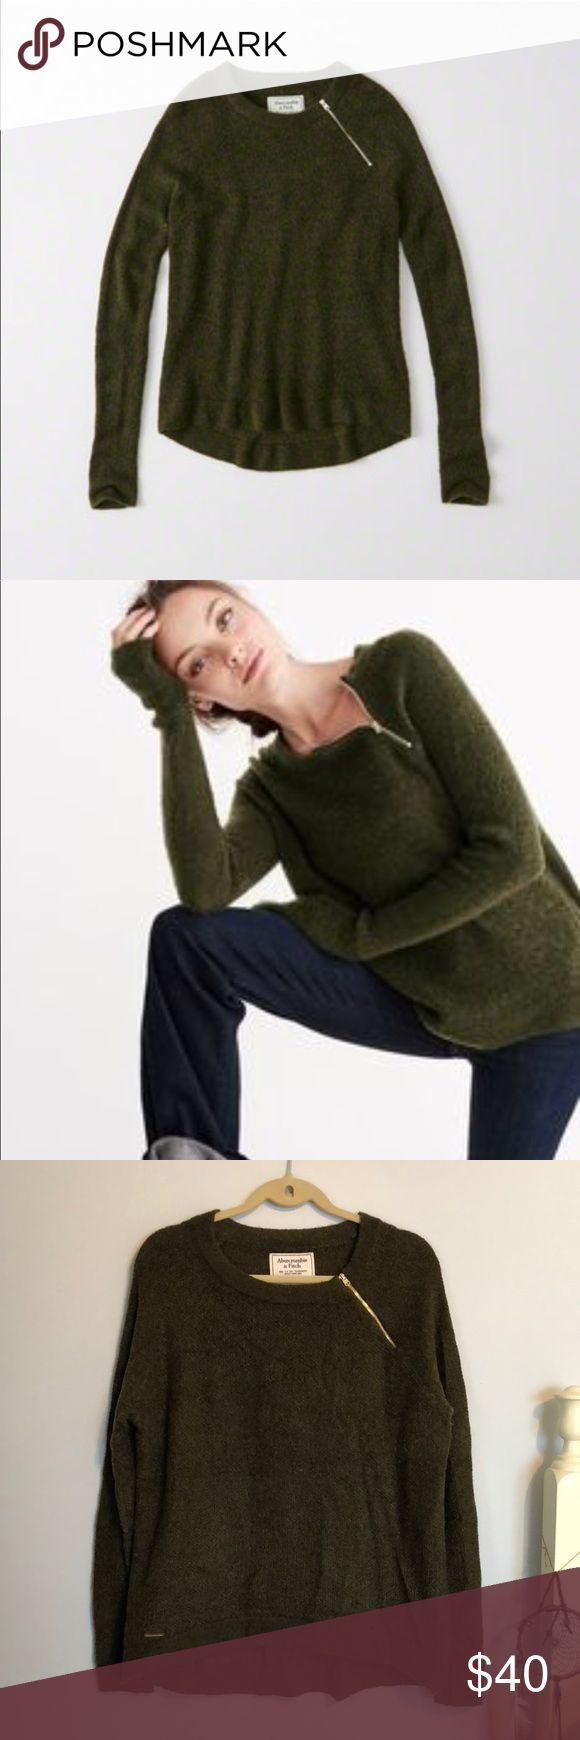 Best 25  Olive green sweater ideas on Pinterest | Fall jackets ...